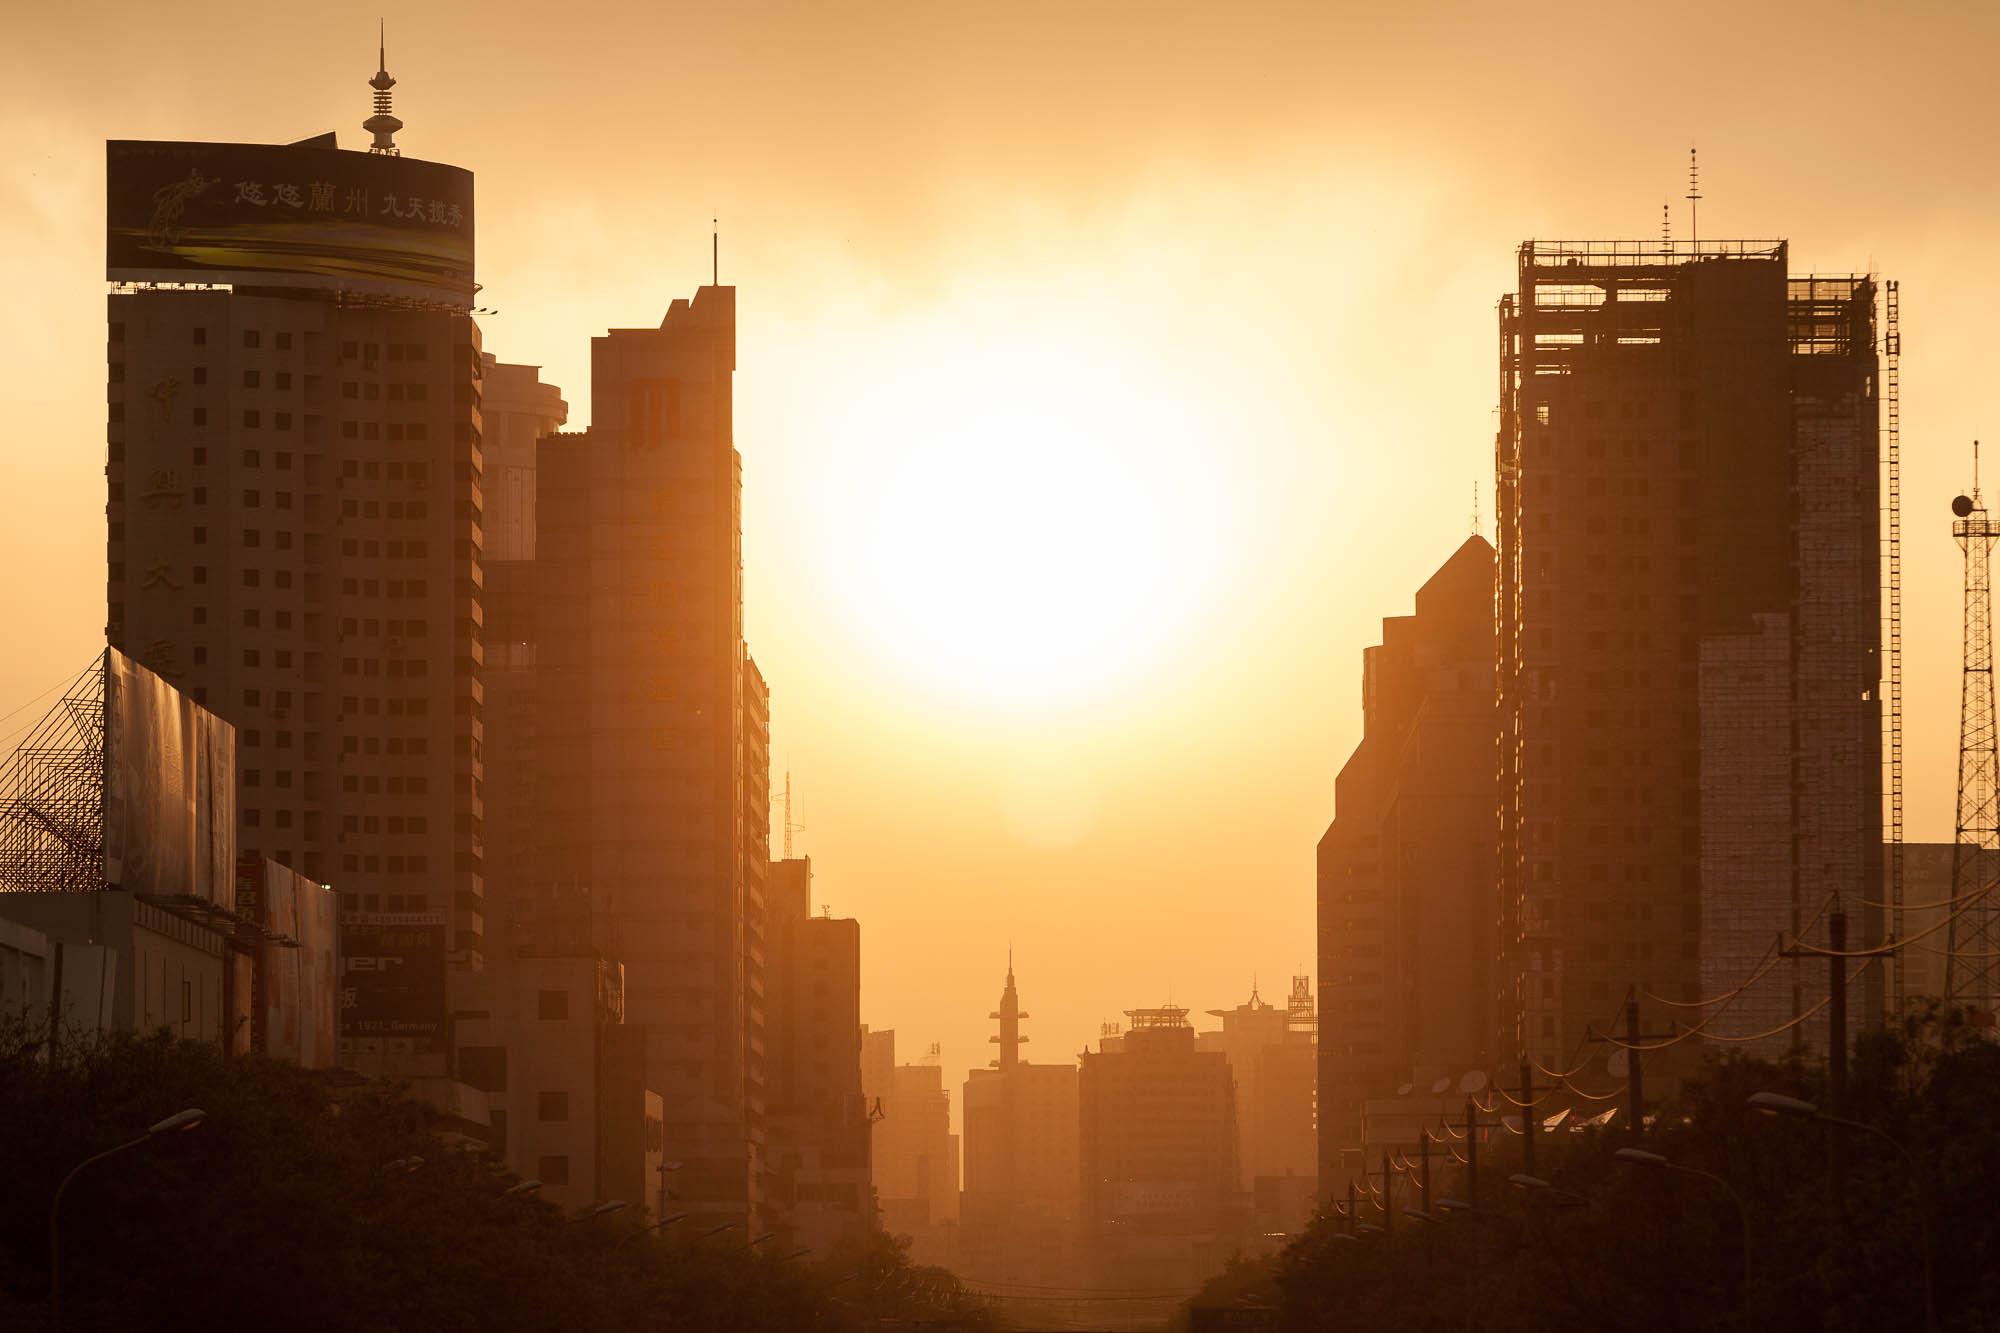 sunset in Lanzhou